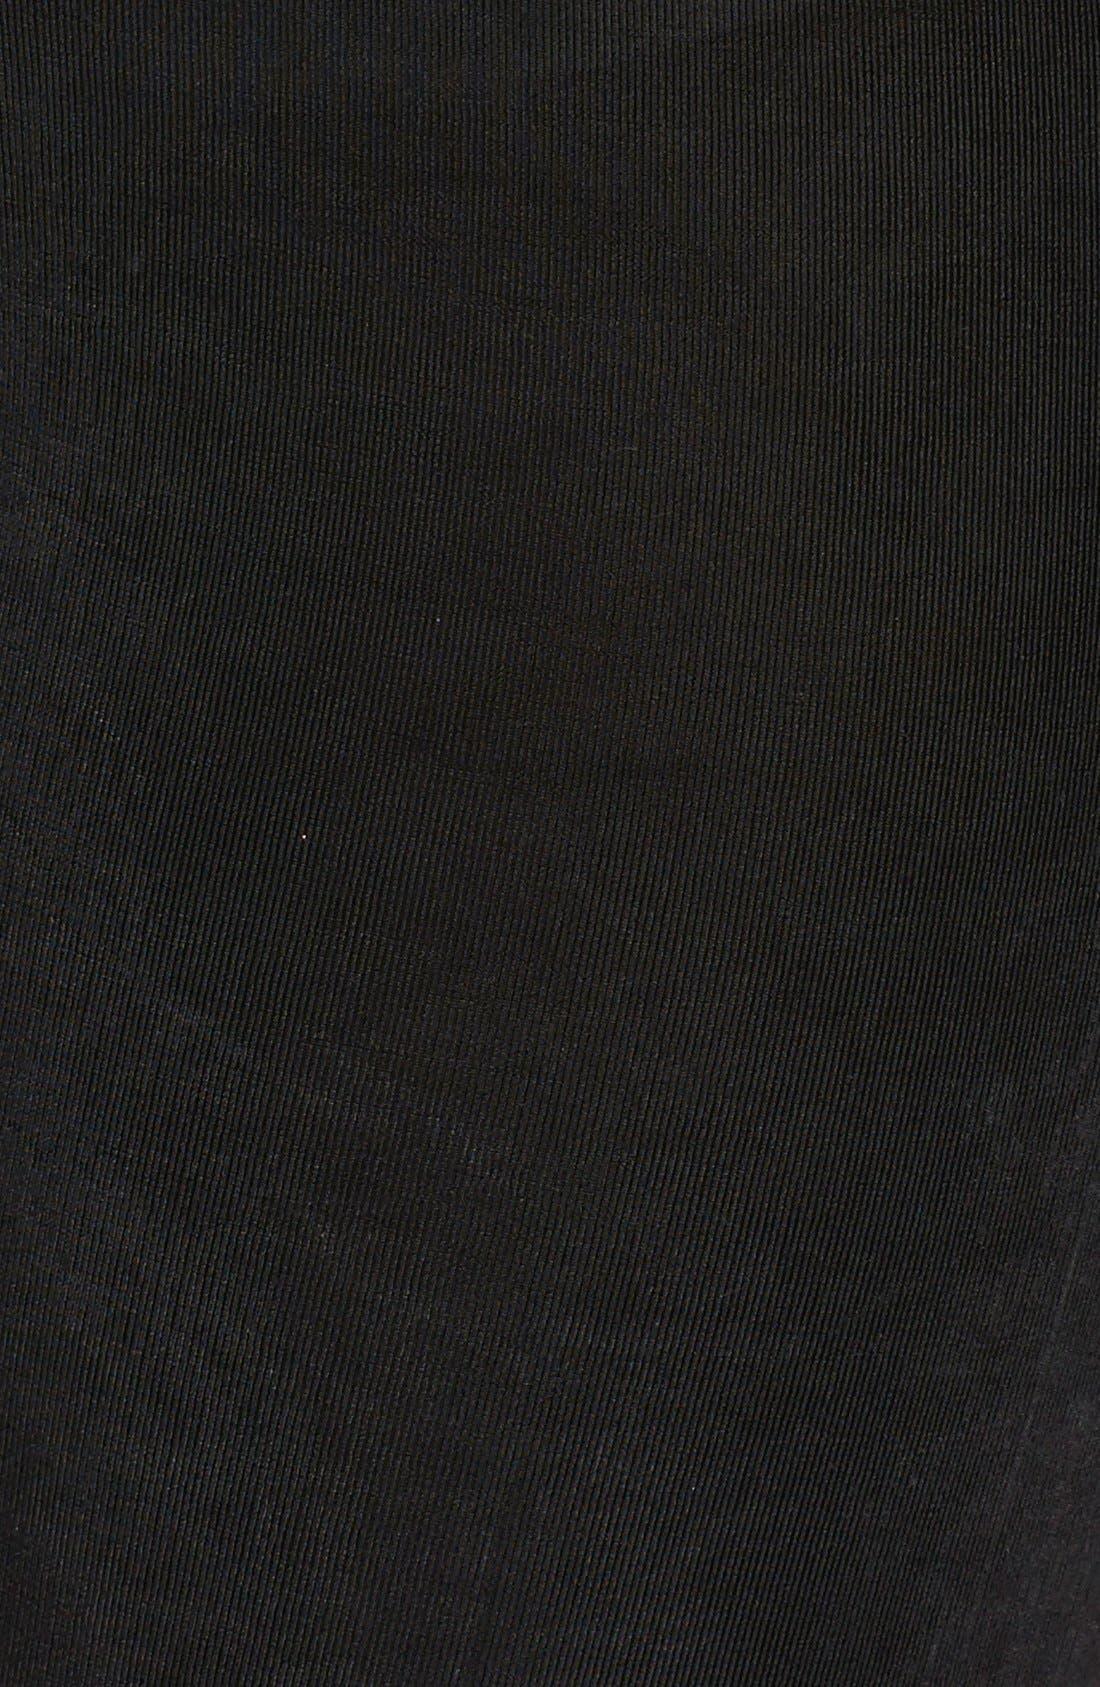 High Rise Stretch Knit Slim Pants,                             Alternate thumbnail 3, color,                             BLACK